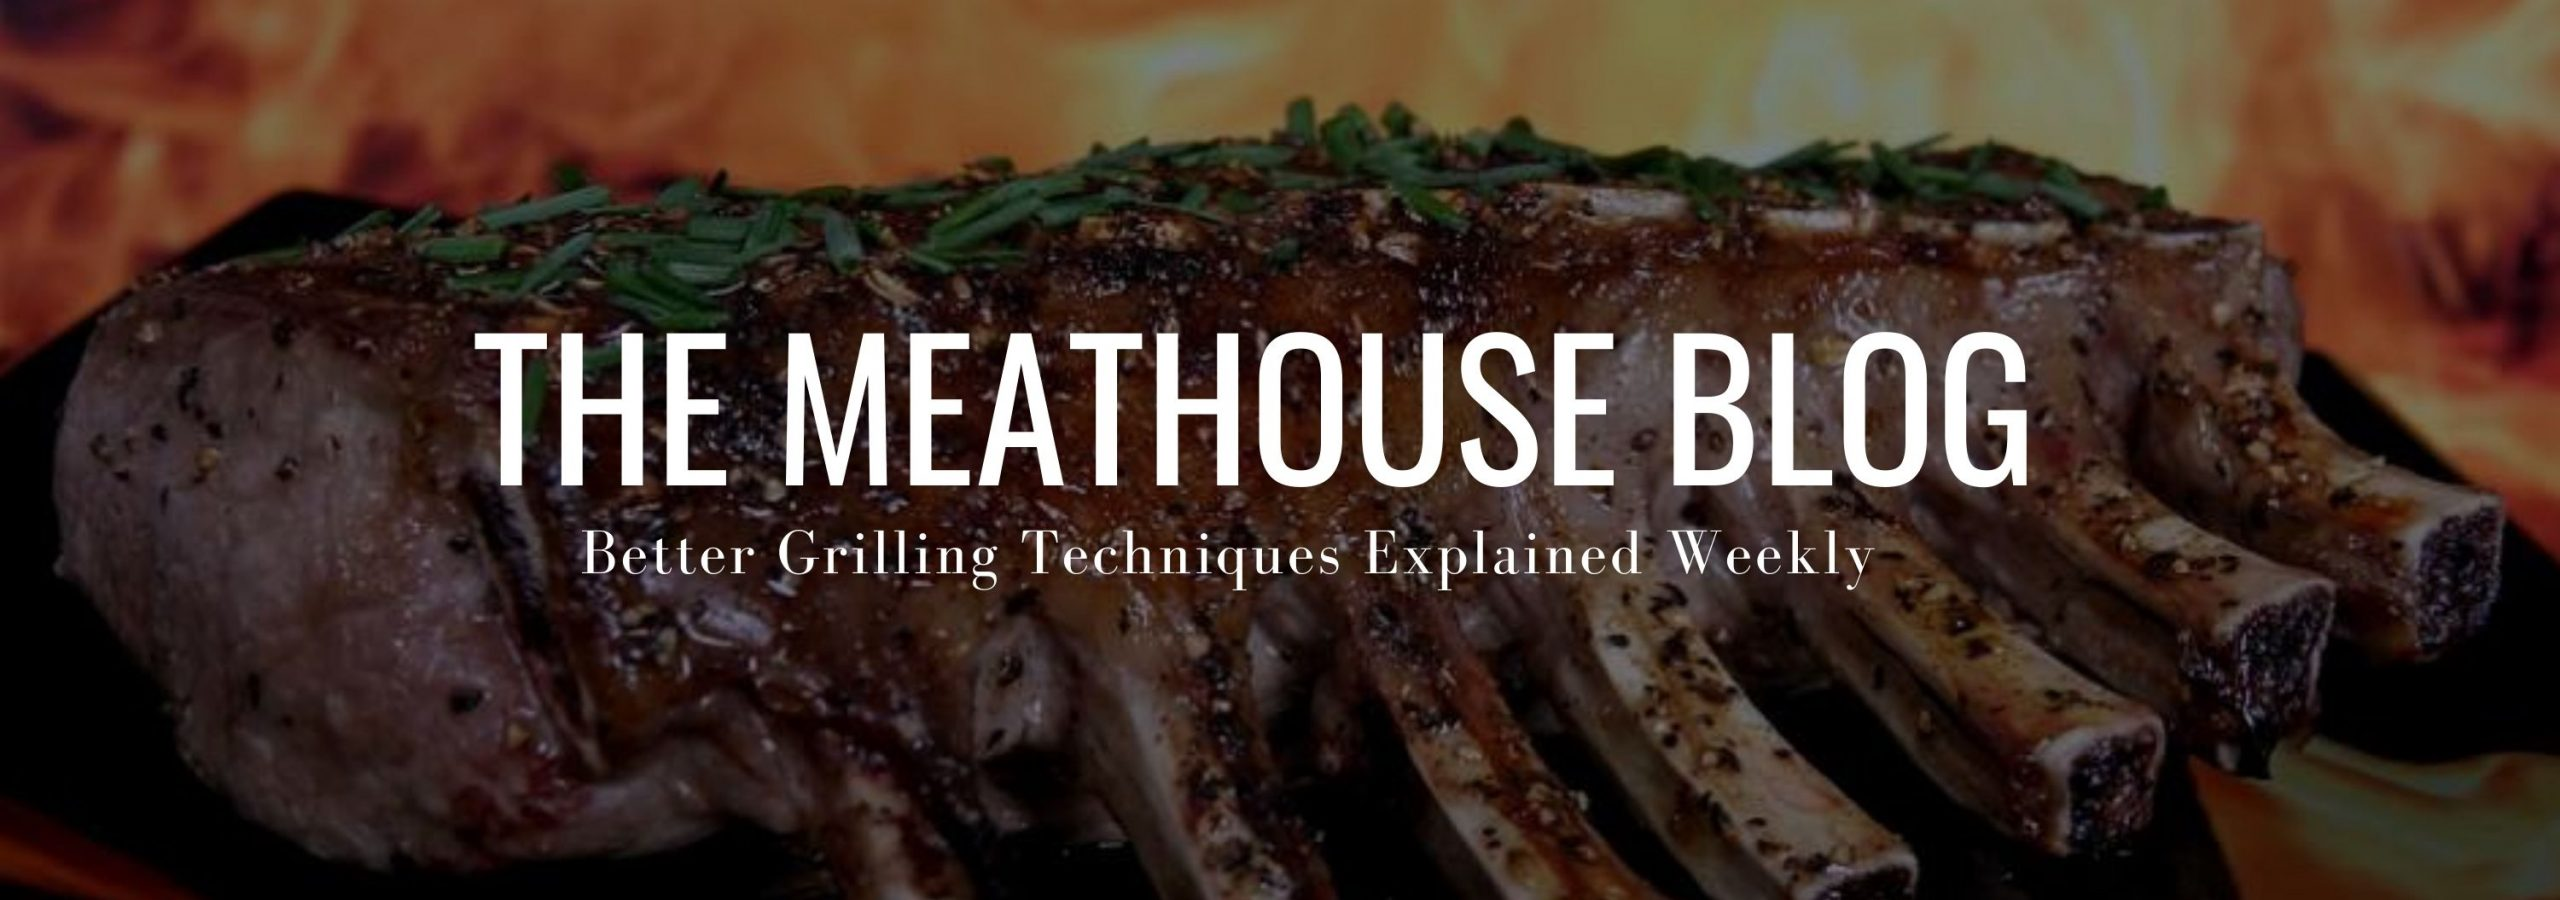 The MeatHouse Blog logo